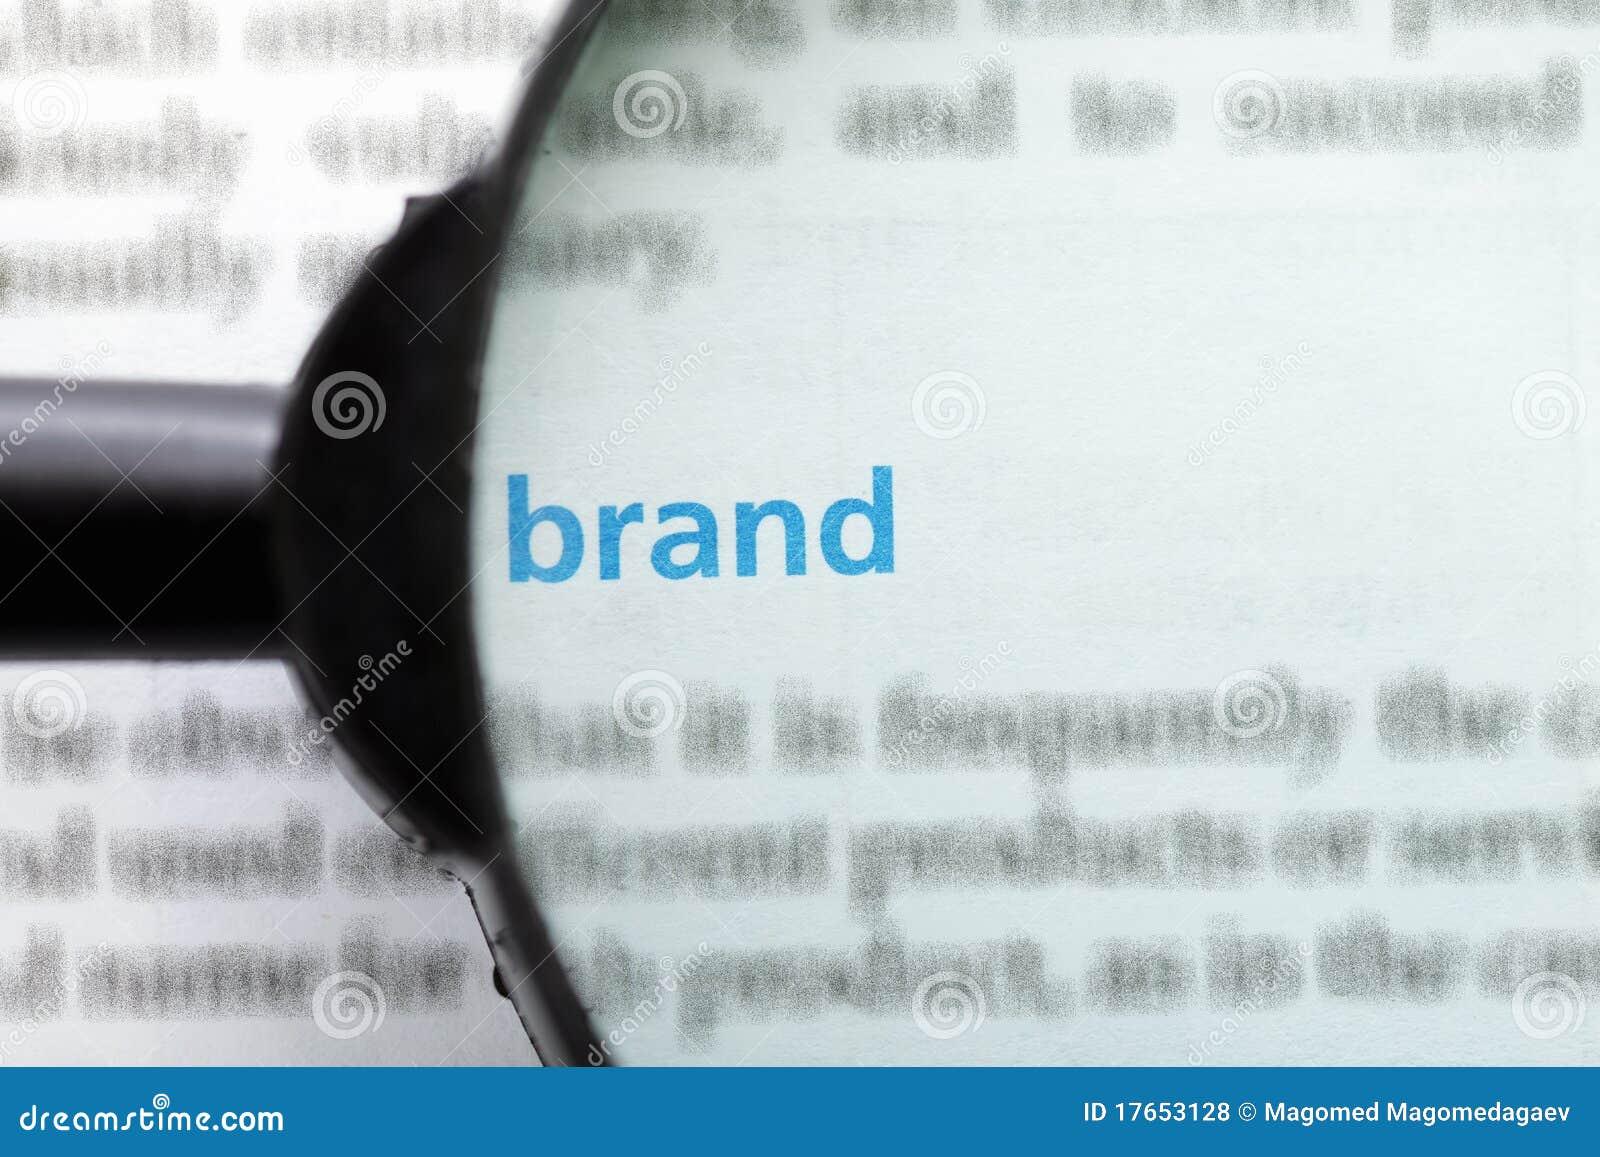 Focus On Brand Royalty Free Stock Photos - Image: 17653128